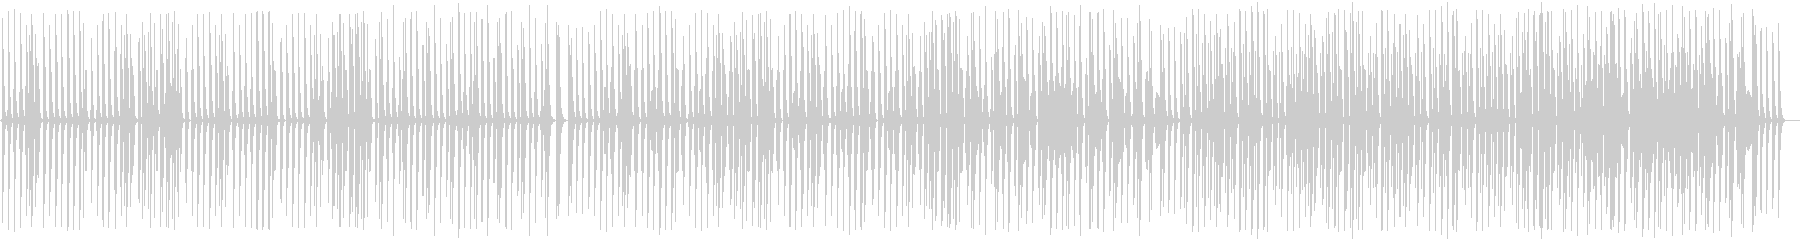 YouTube トイピアノ・おもちゃの未再生の波形